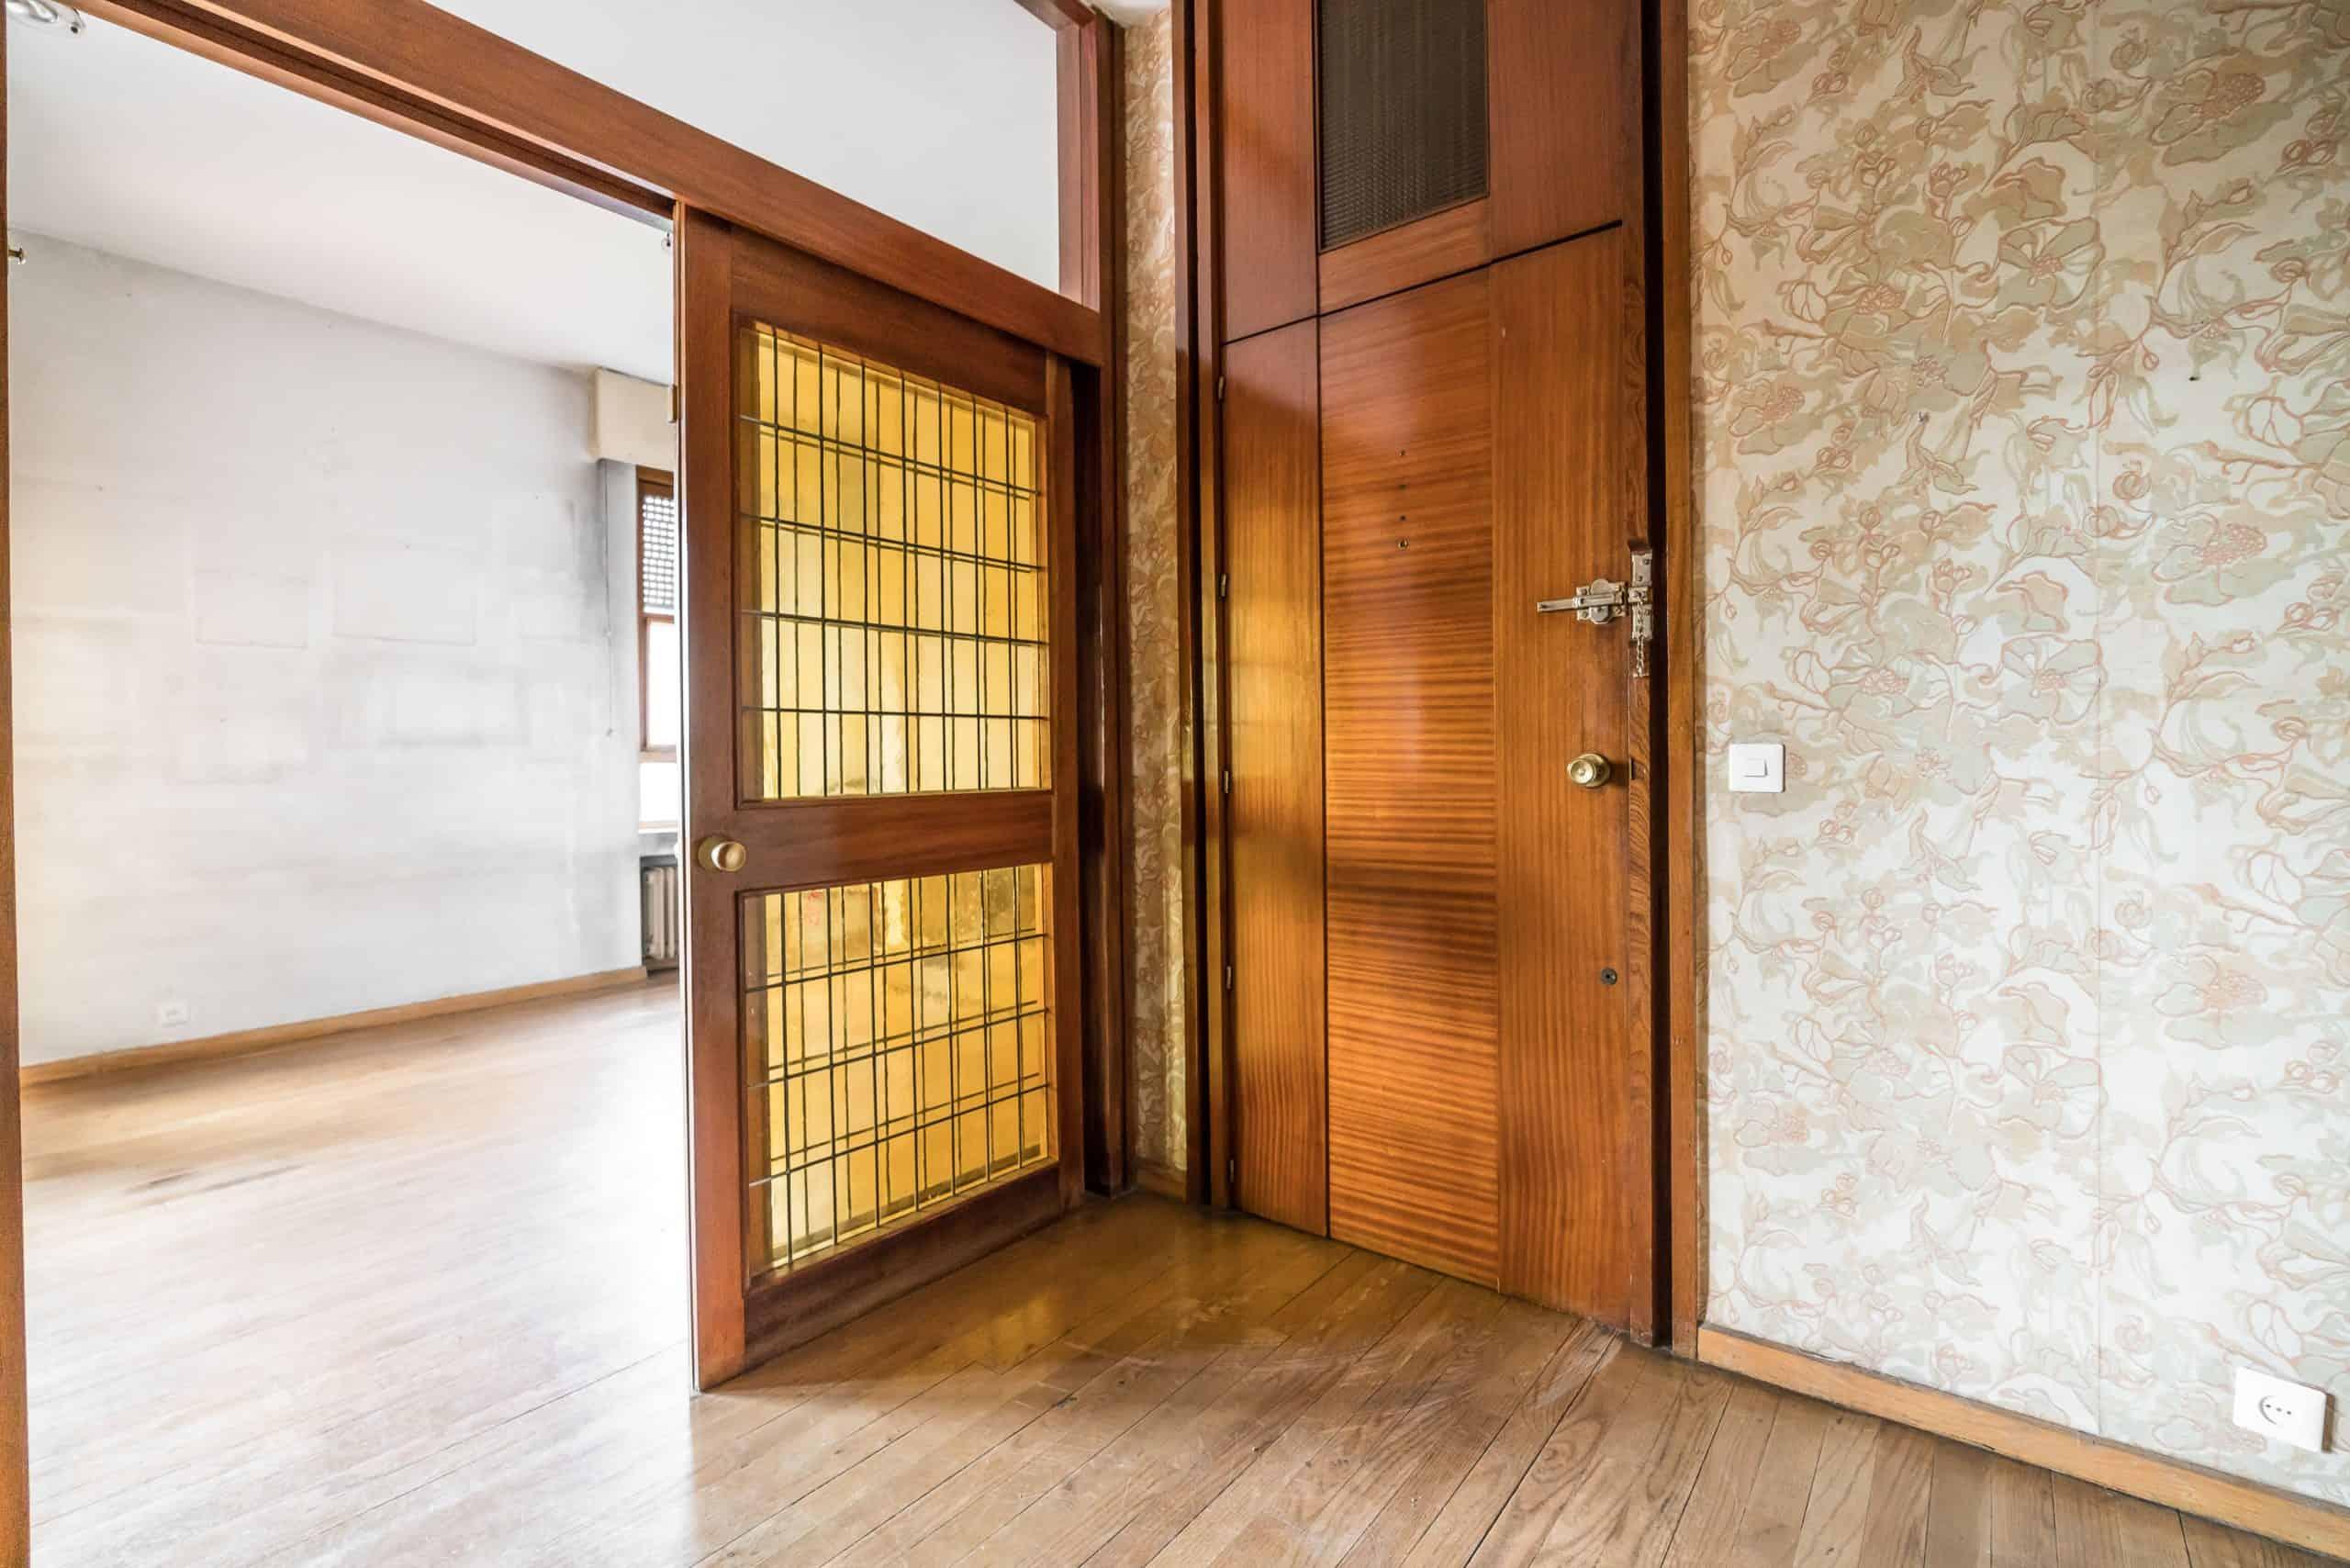 Agencia Inmobiliaria de Madrid-FUTUROCASA-Zona ARGANZUELA-EMBAJADORES-LEGAZPI -calle Embajadores- baño 157